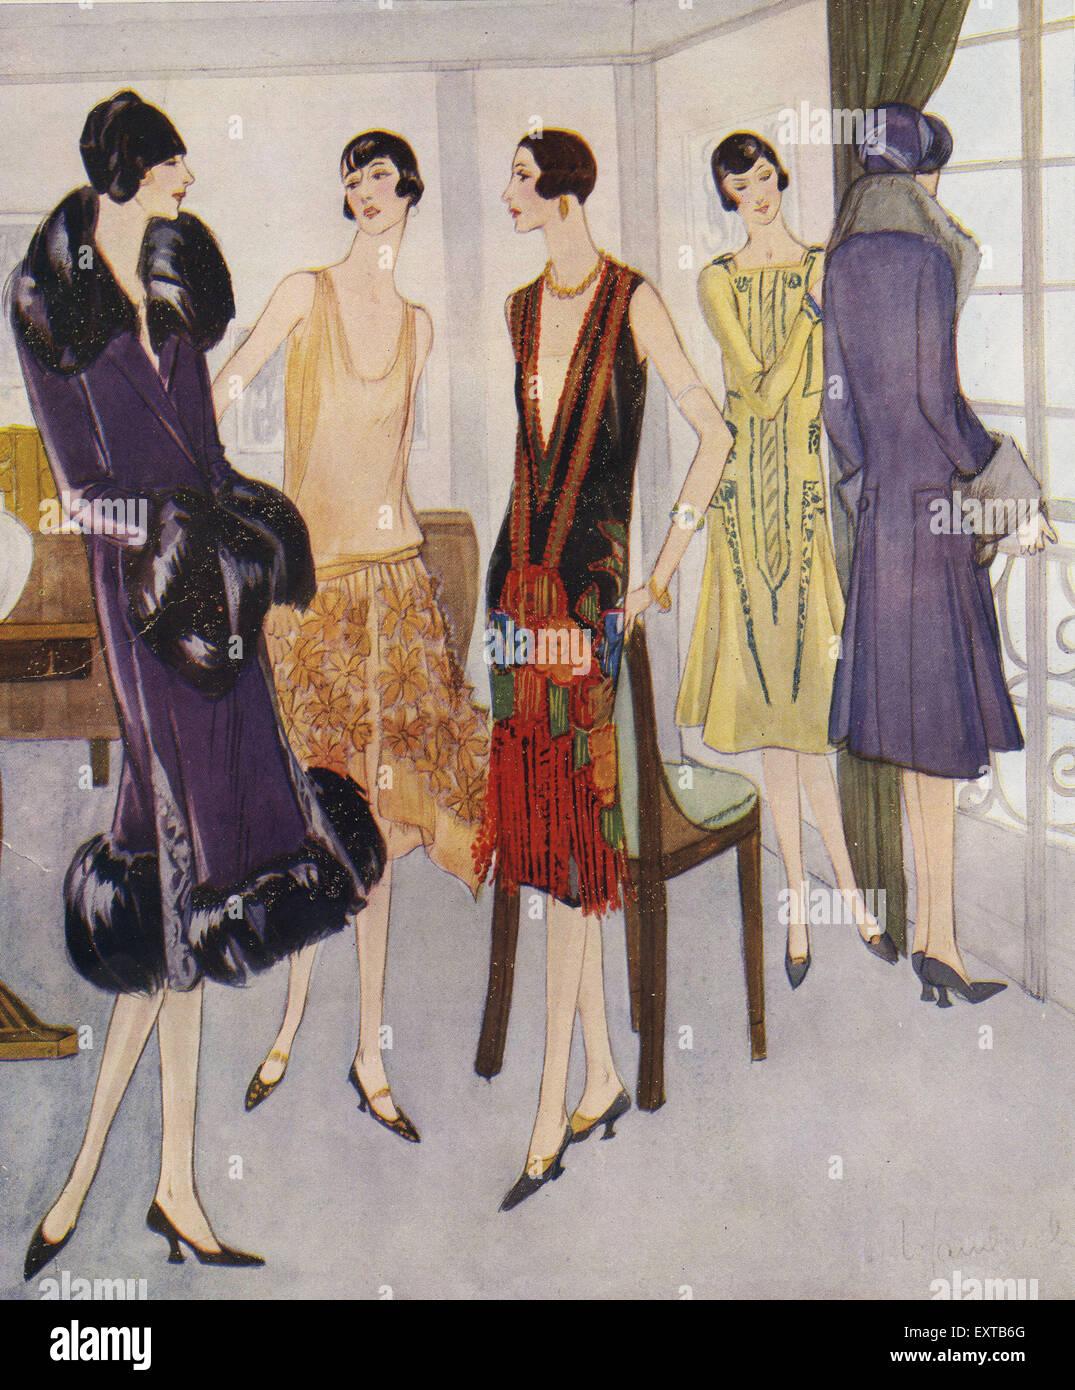 2175fe98dc6 1920s Fashion Stock Photos & 1920s Fashion Stock Images - Alamy